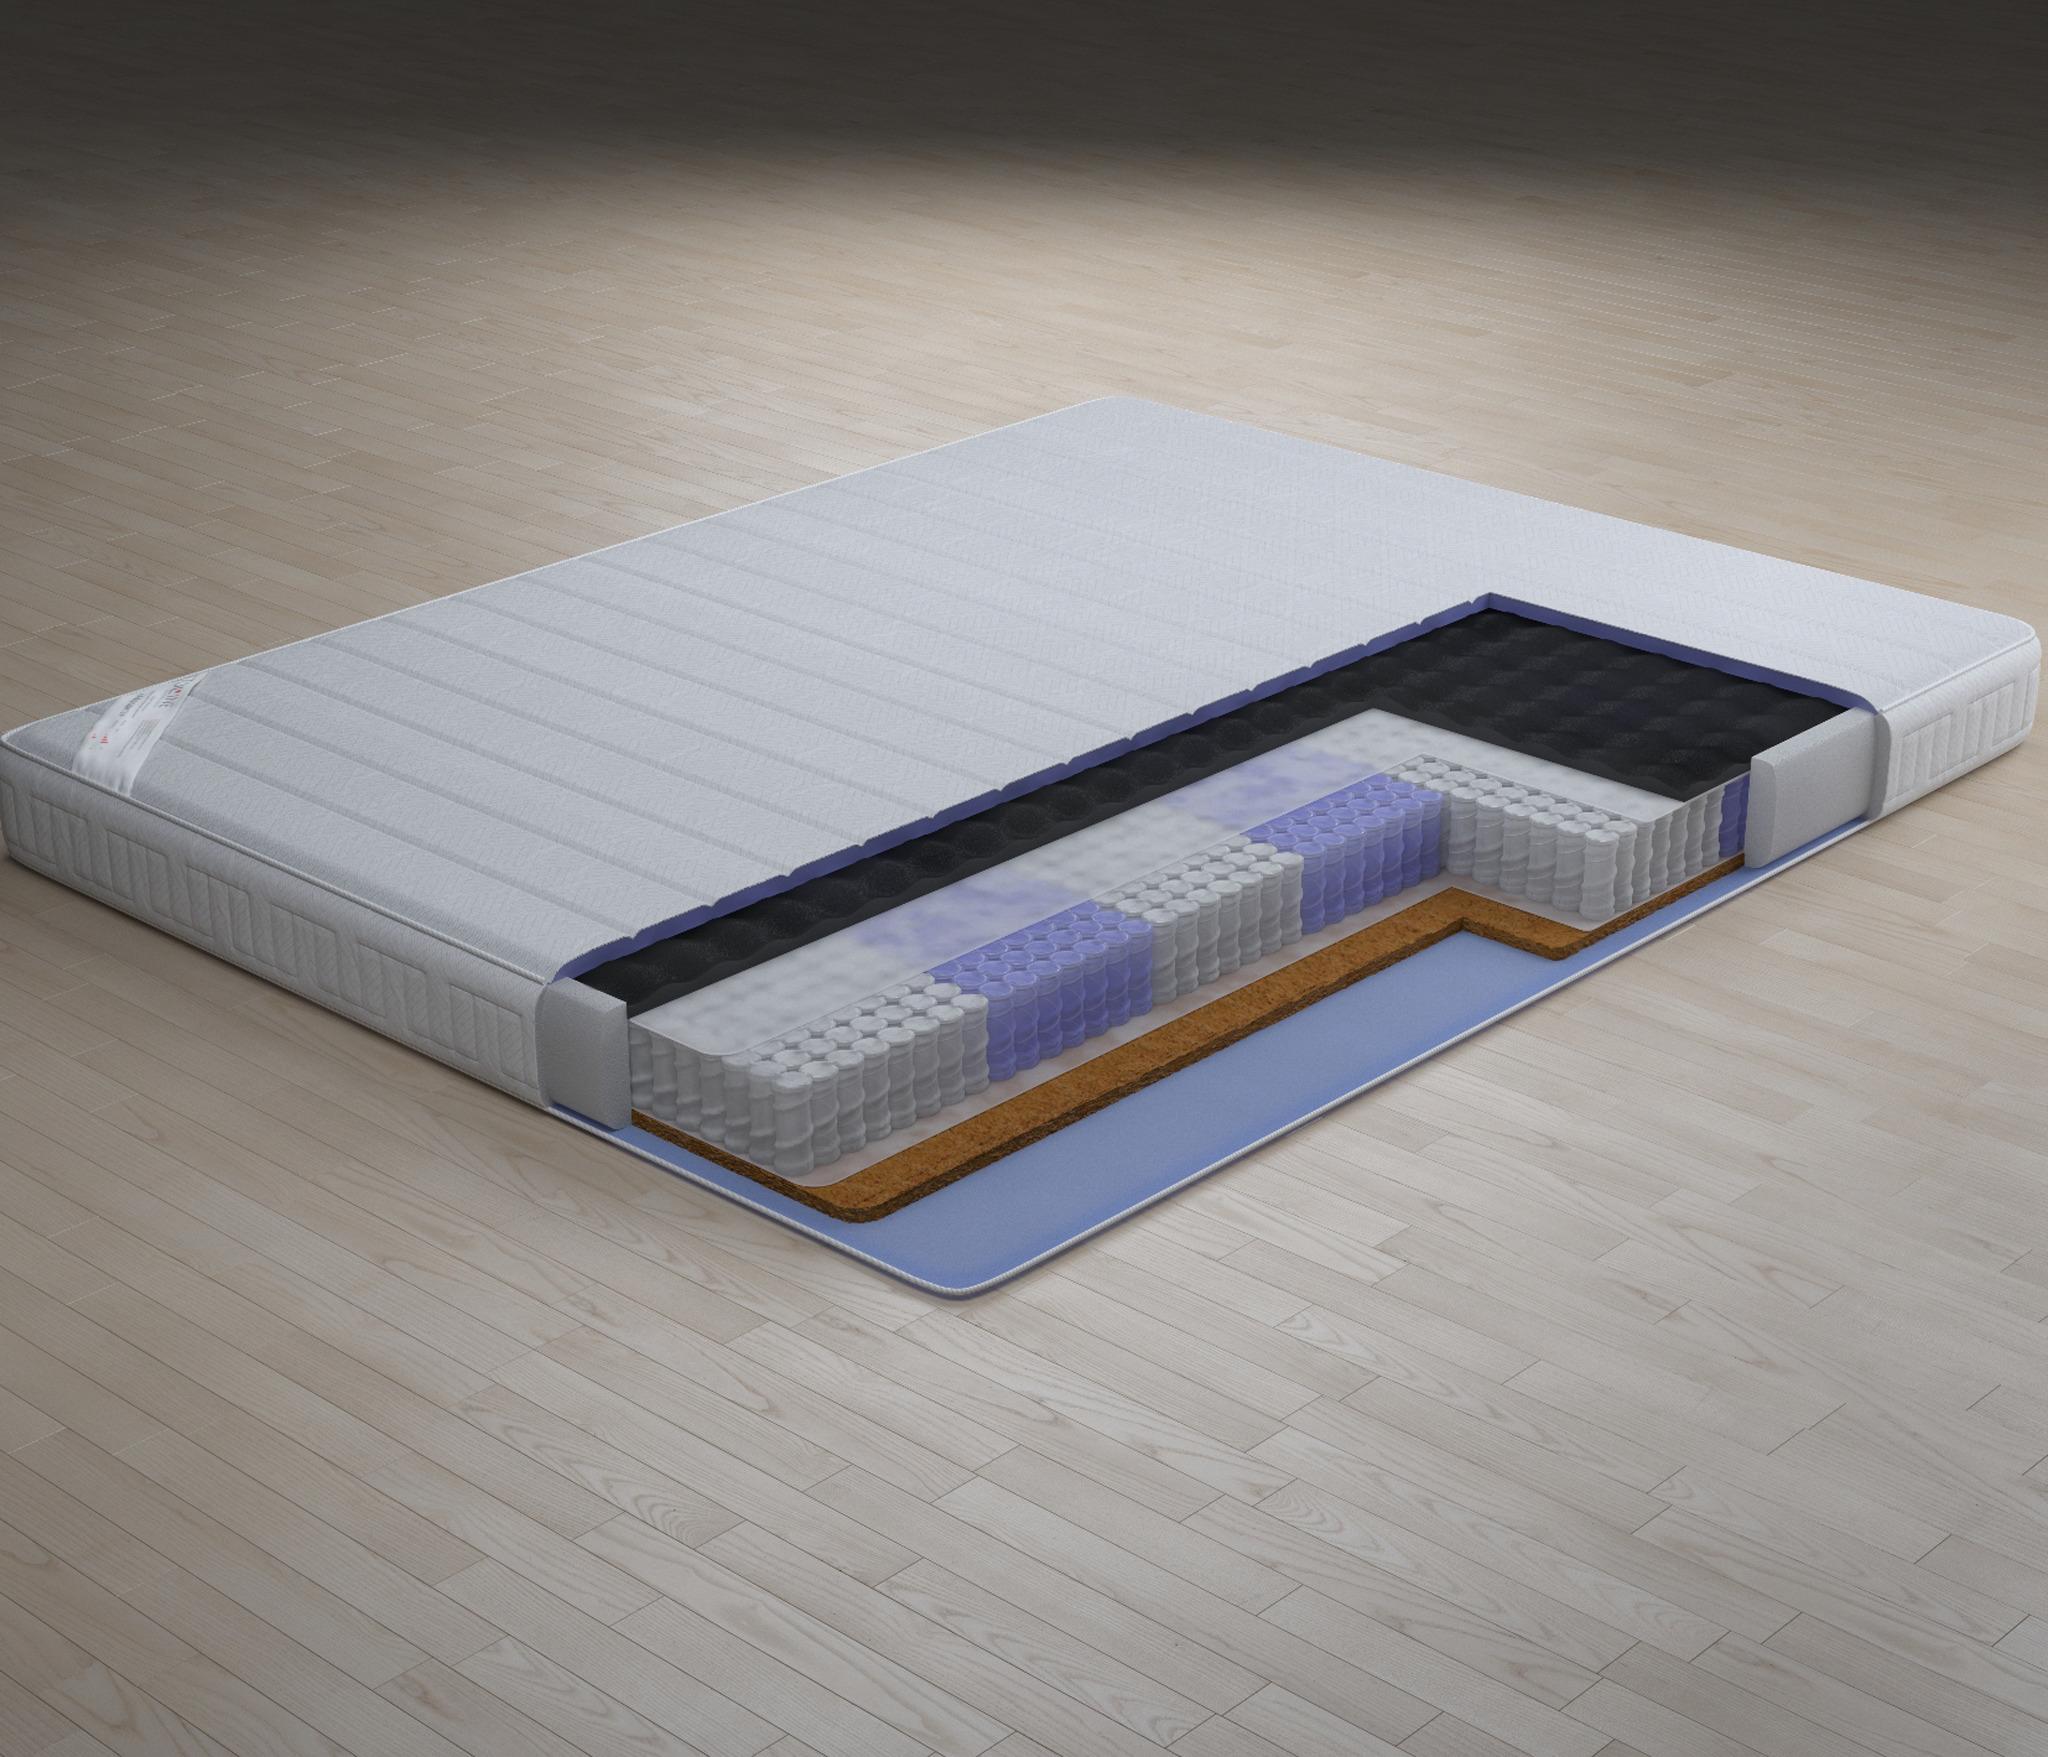 Матрас Галактика сна - Веста  900*1900Мебель для спальни<br><br><br>Длина мм: 900<br>Высота мм: 190<br>Глубина мм: 1900